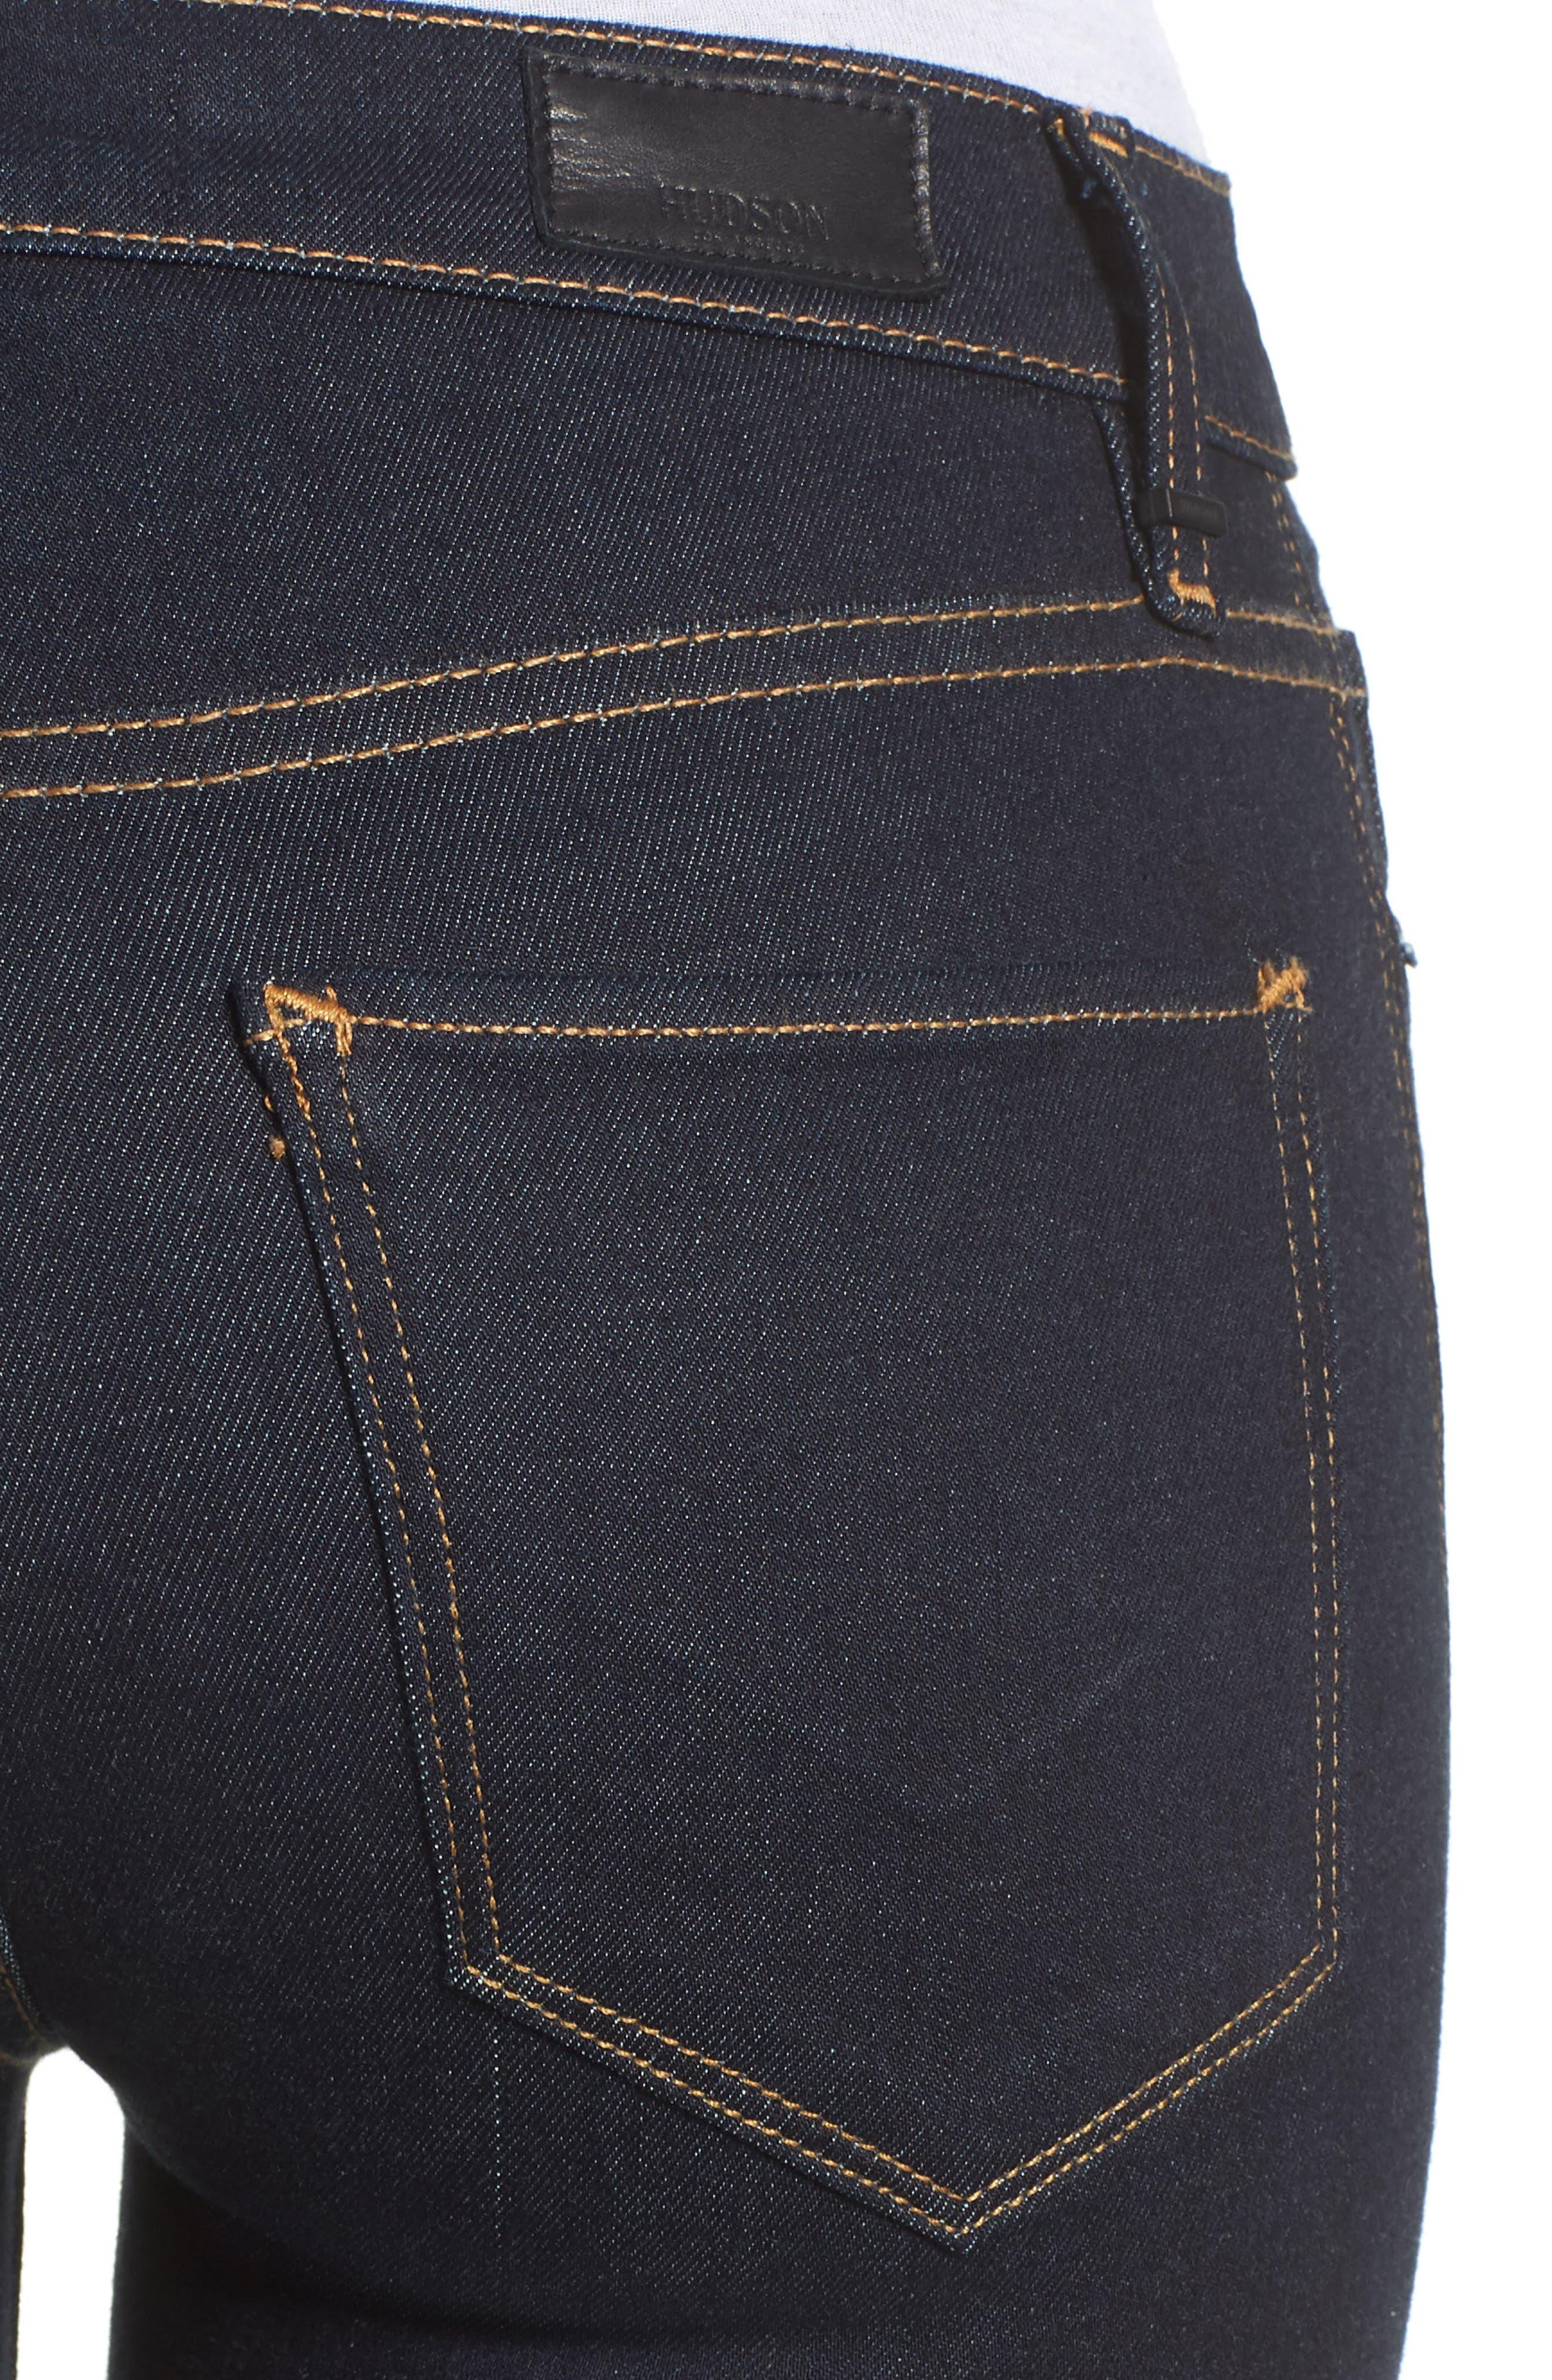 Nico Super Skinny Jeans,                             Alternate thumbnail 4, color,                             SUNSET BLVD